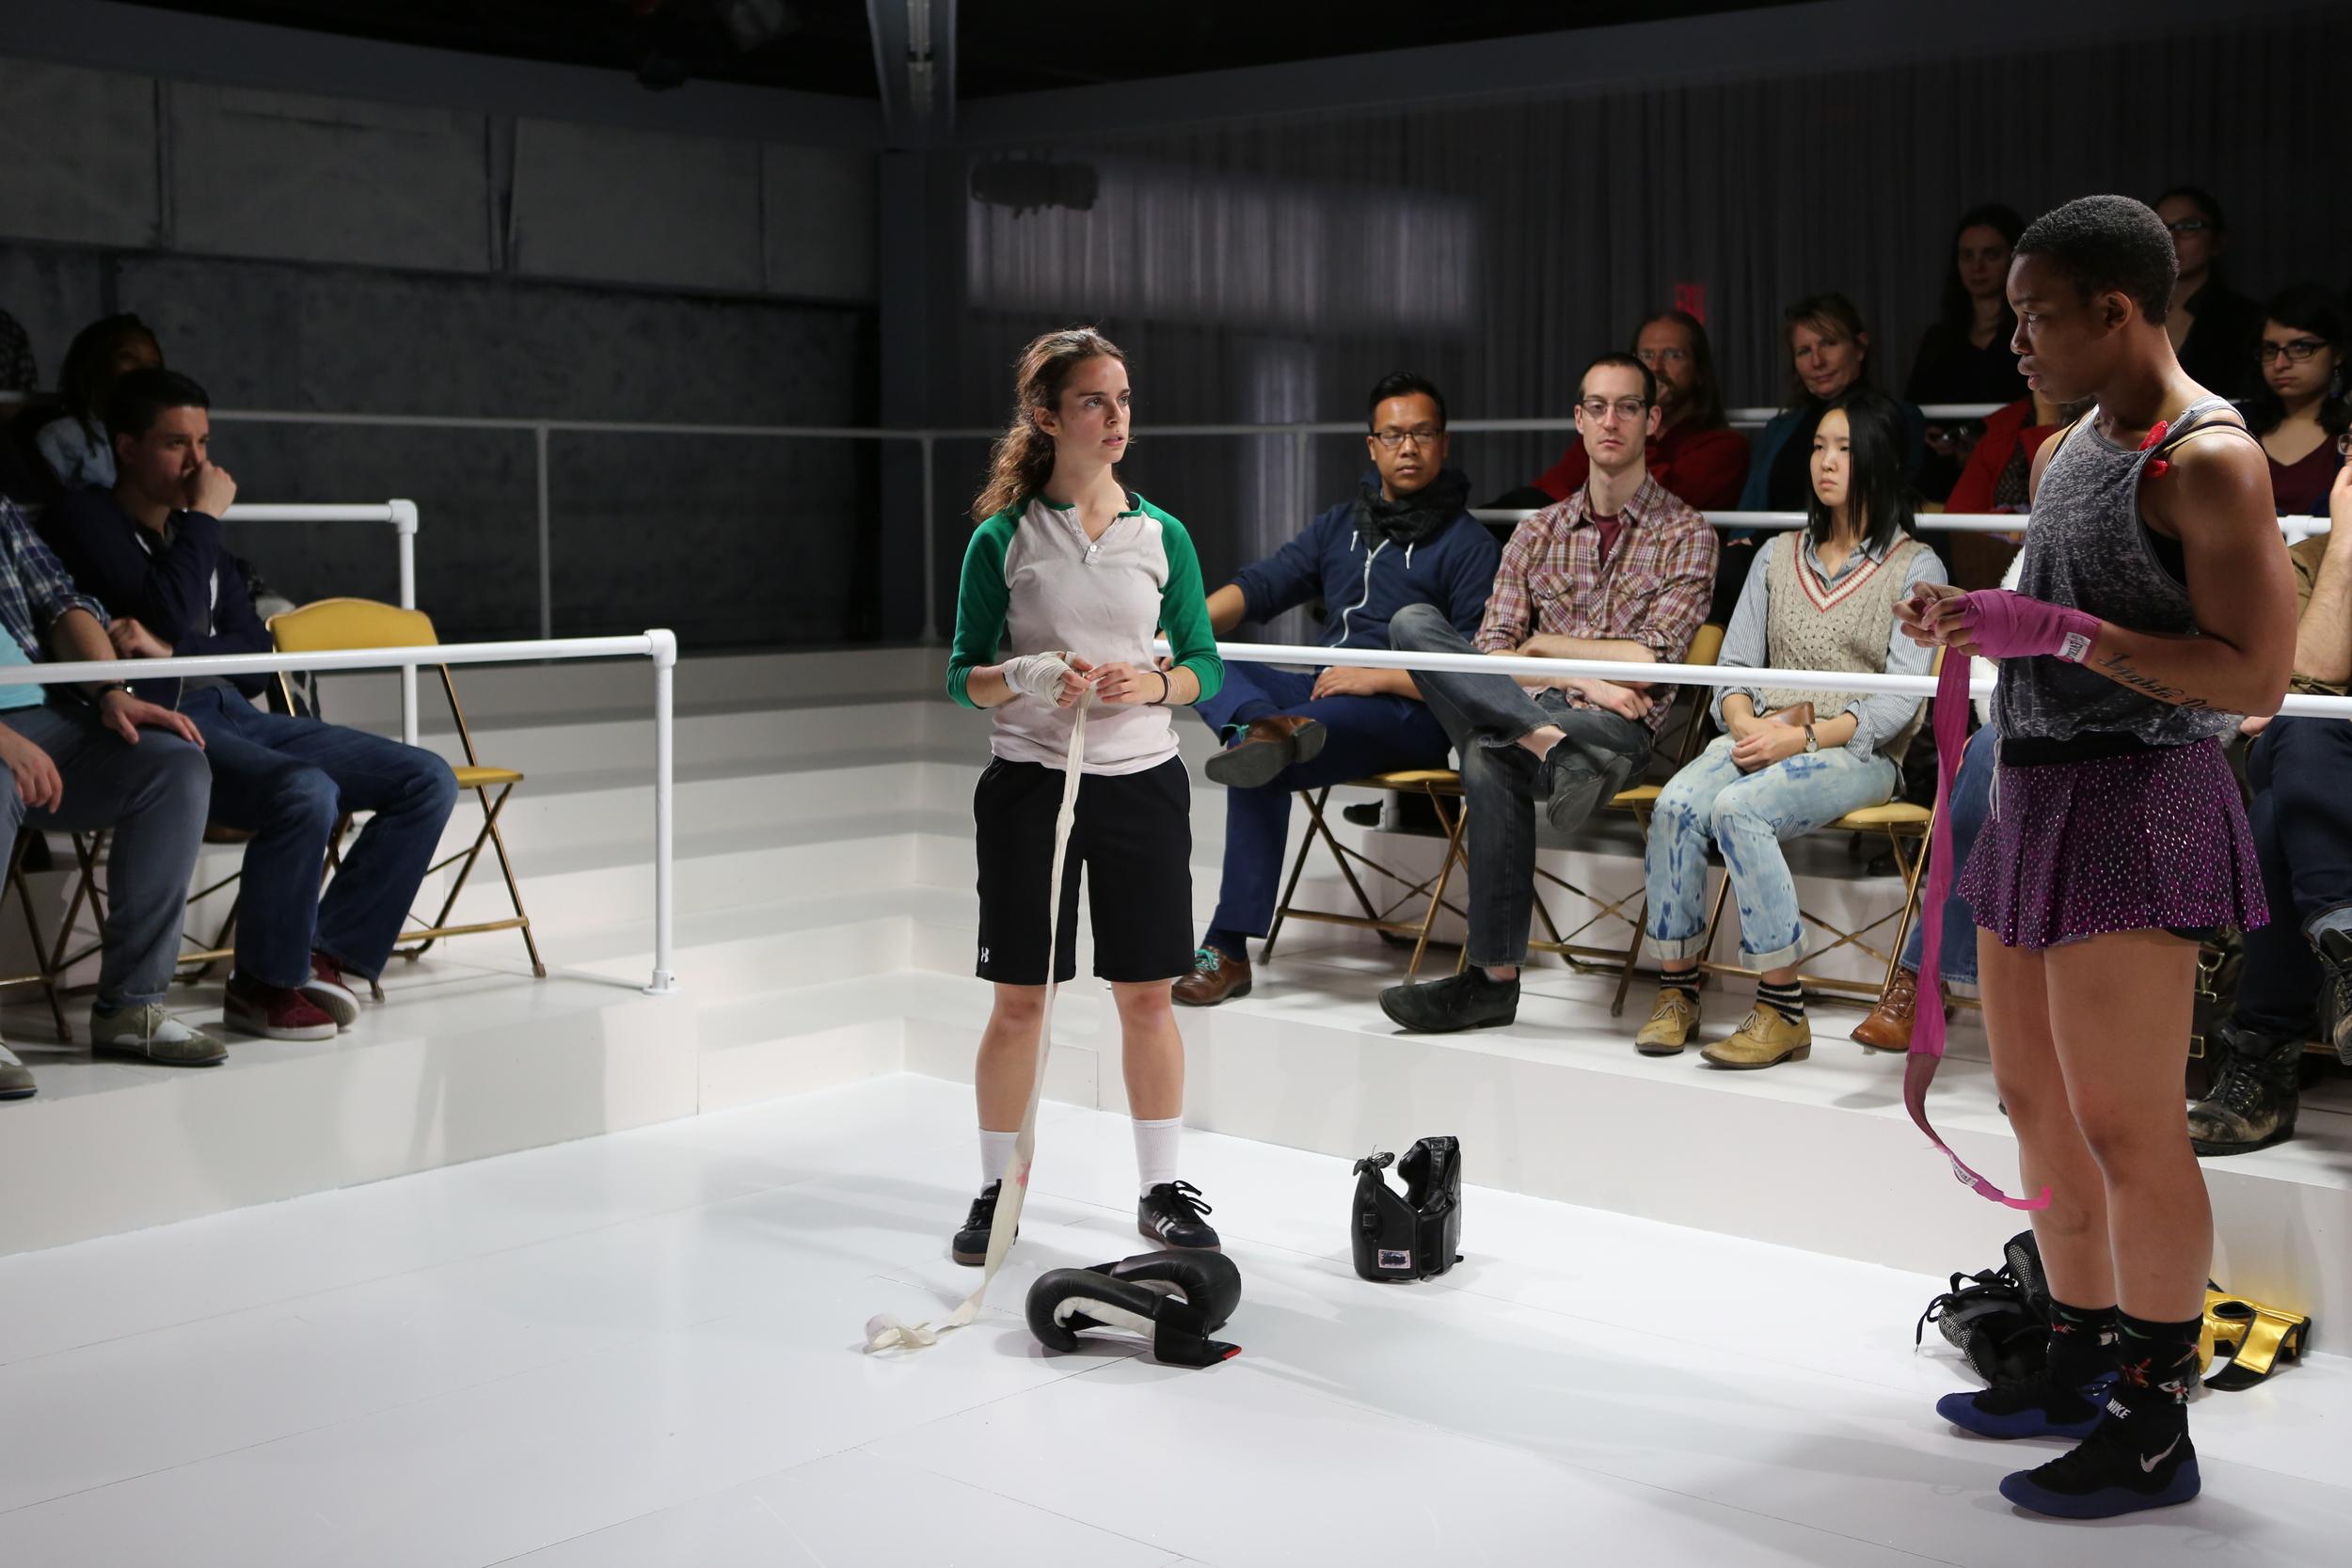 Director : Scott Illingsworth  Set : Felicitas Lamenca  Costumes : Joseph Blaha  Photo : Ella Bromblin